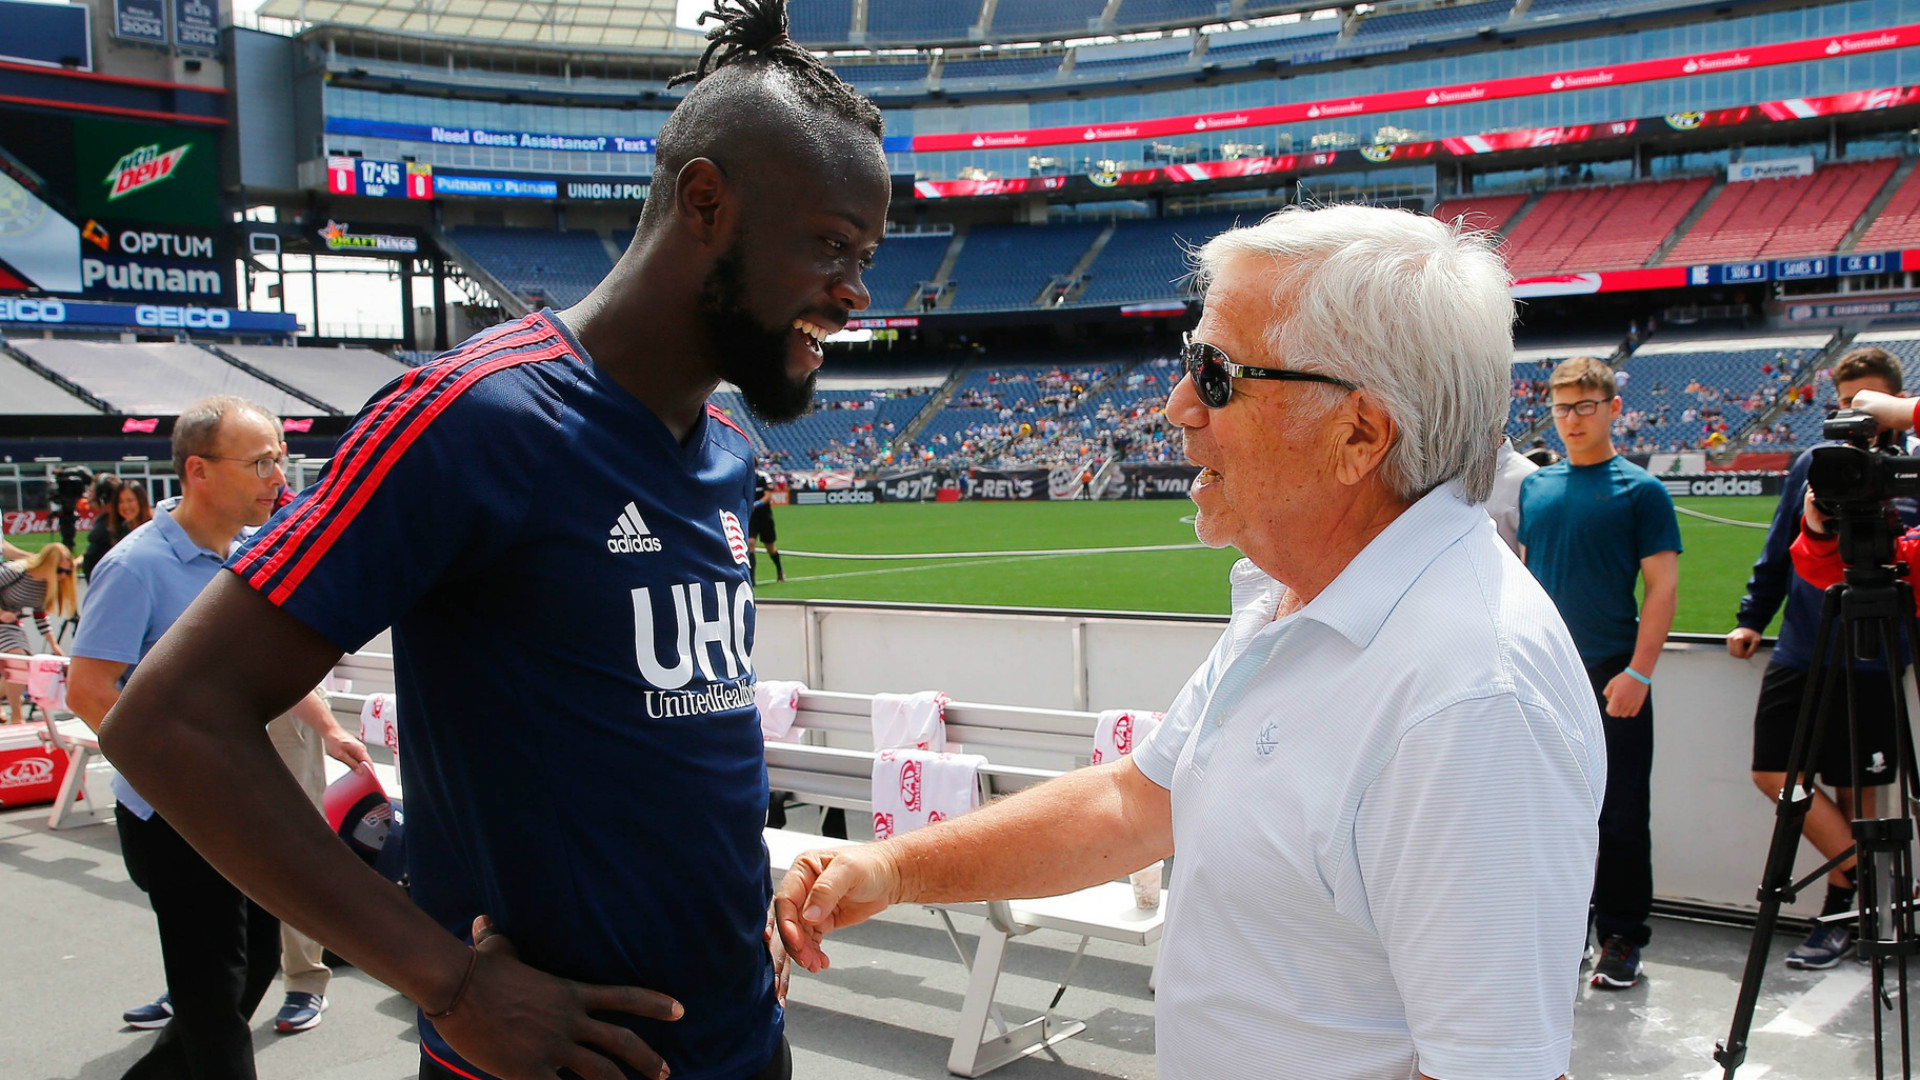 Kei Kamara MLS New England Revolution 05212017